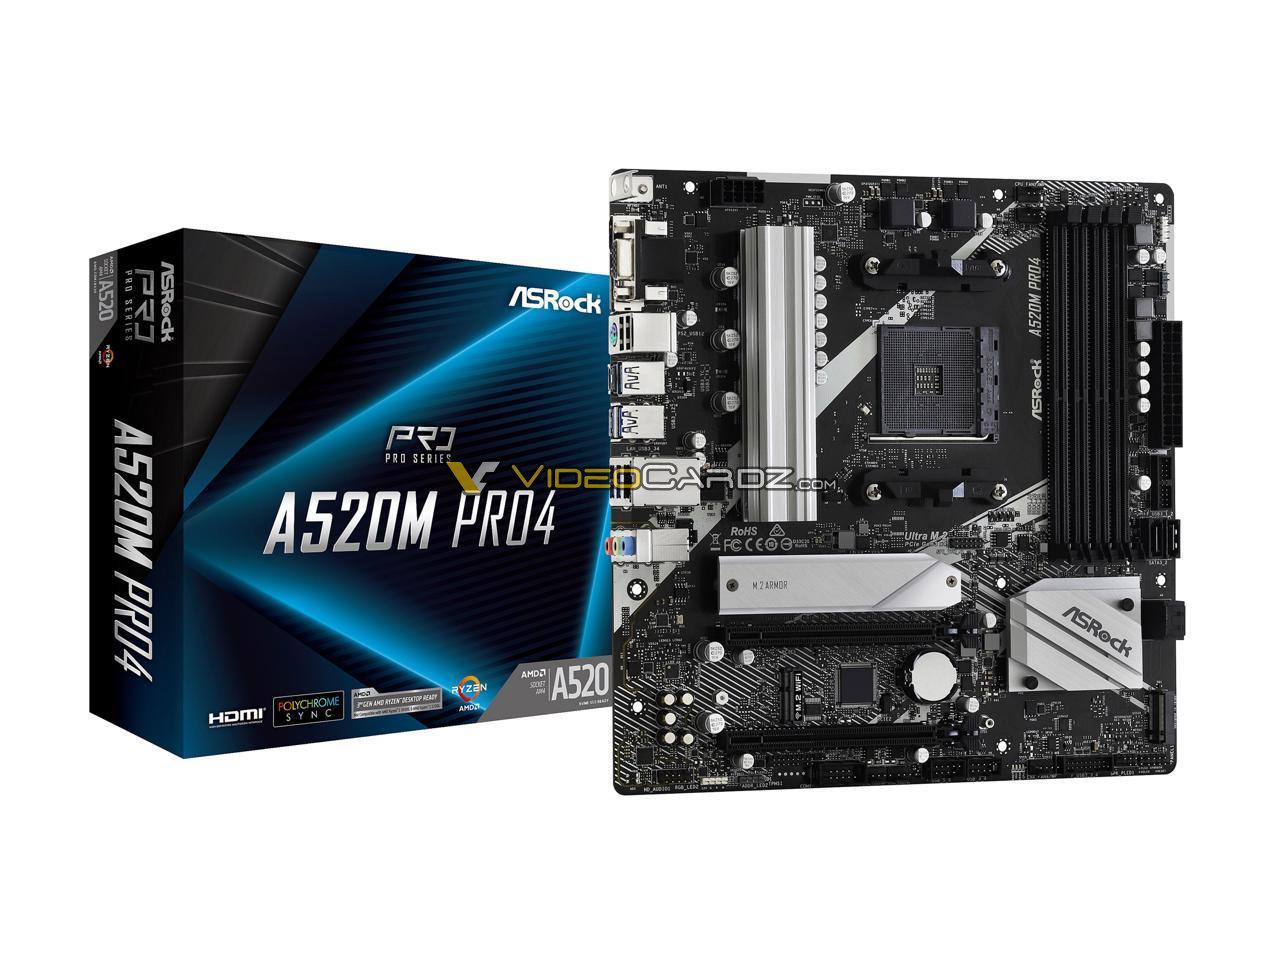 asrock-a520m-pro4-motherboard_1